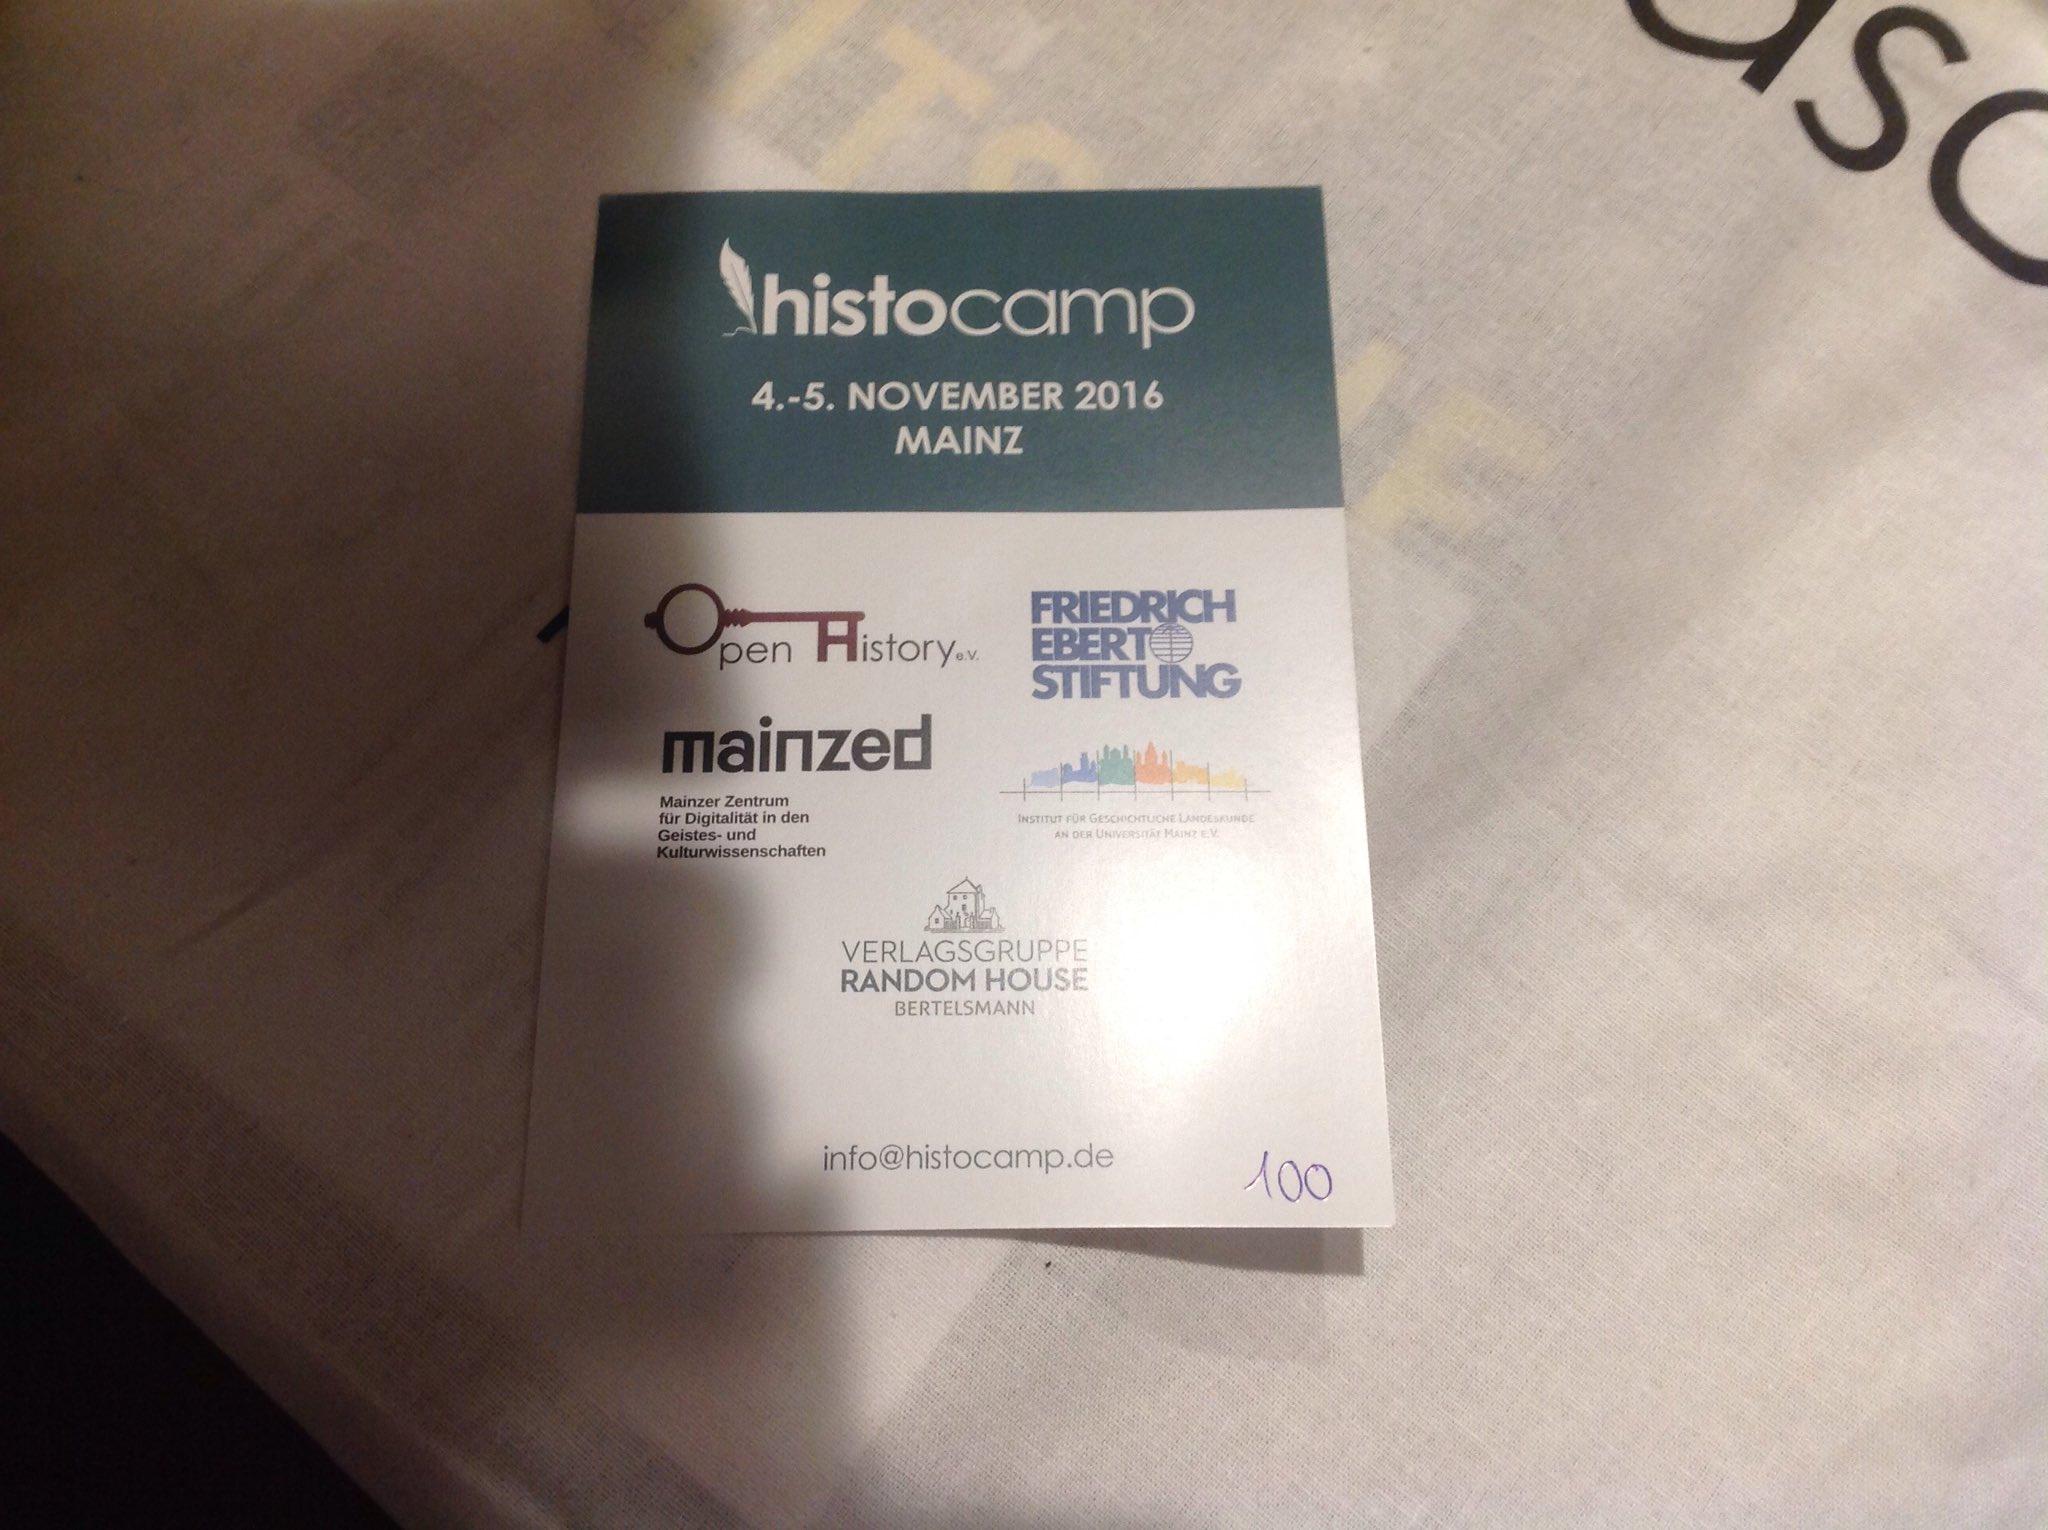 Thumbnail for histocamp 2016 - Rückblick